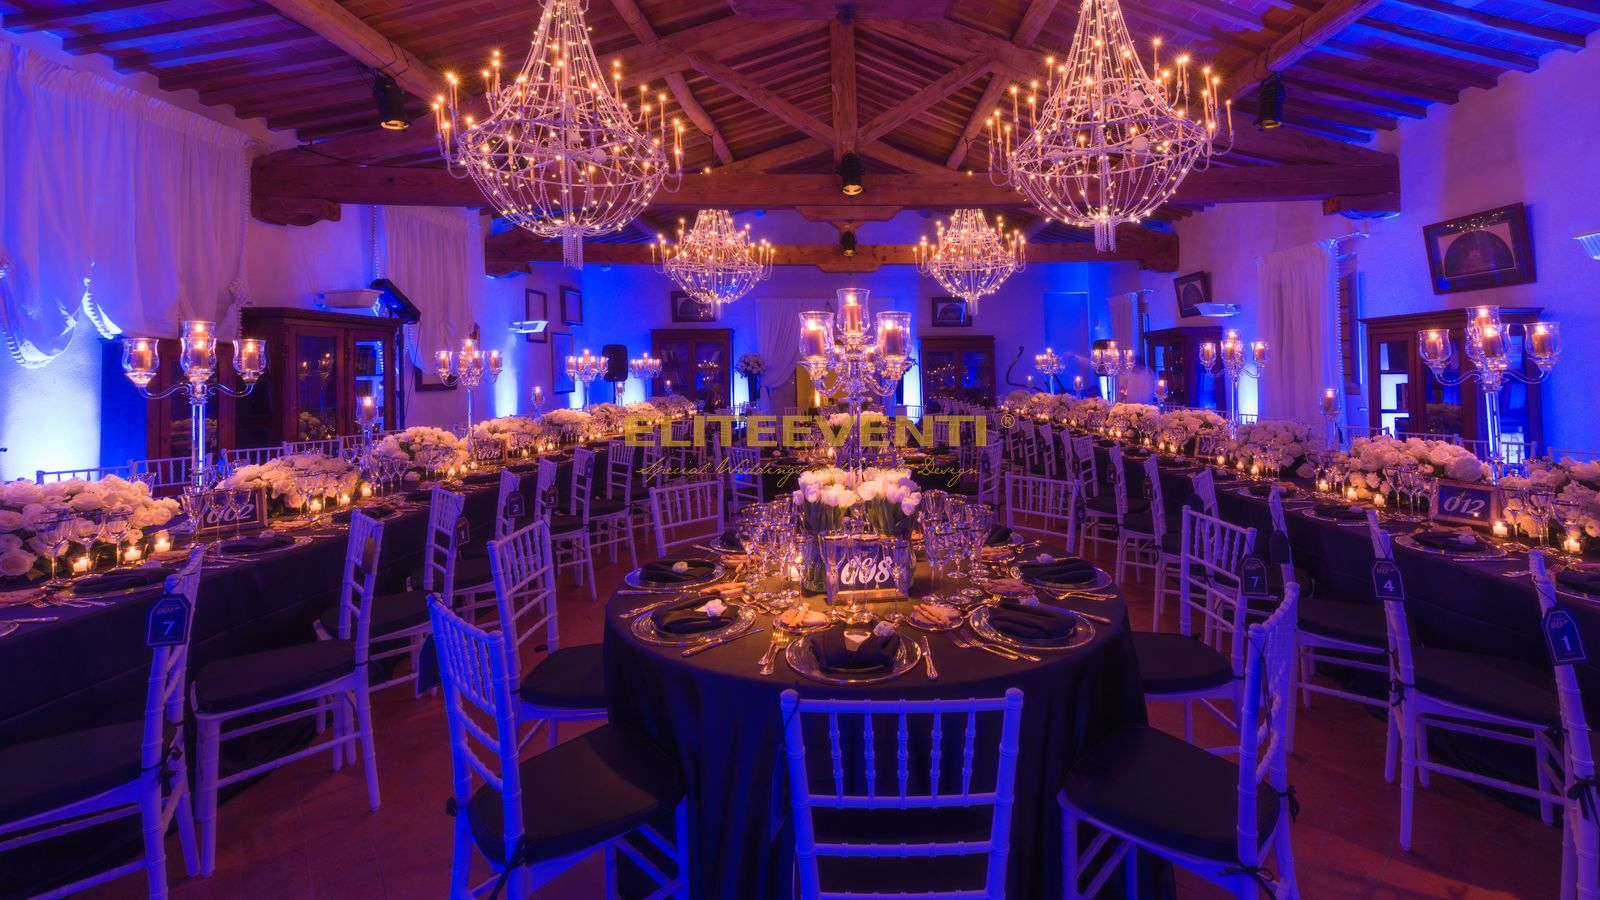 Villa Scory dinner party by Eliteeventi